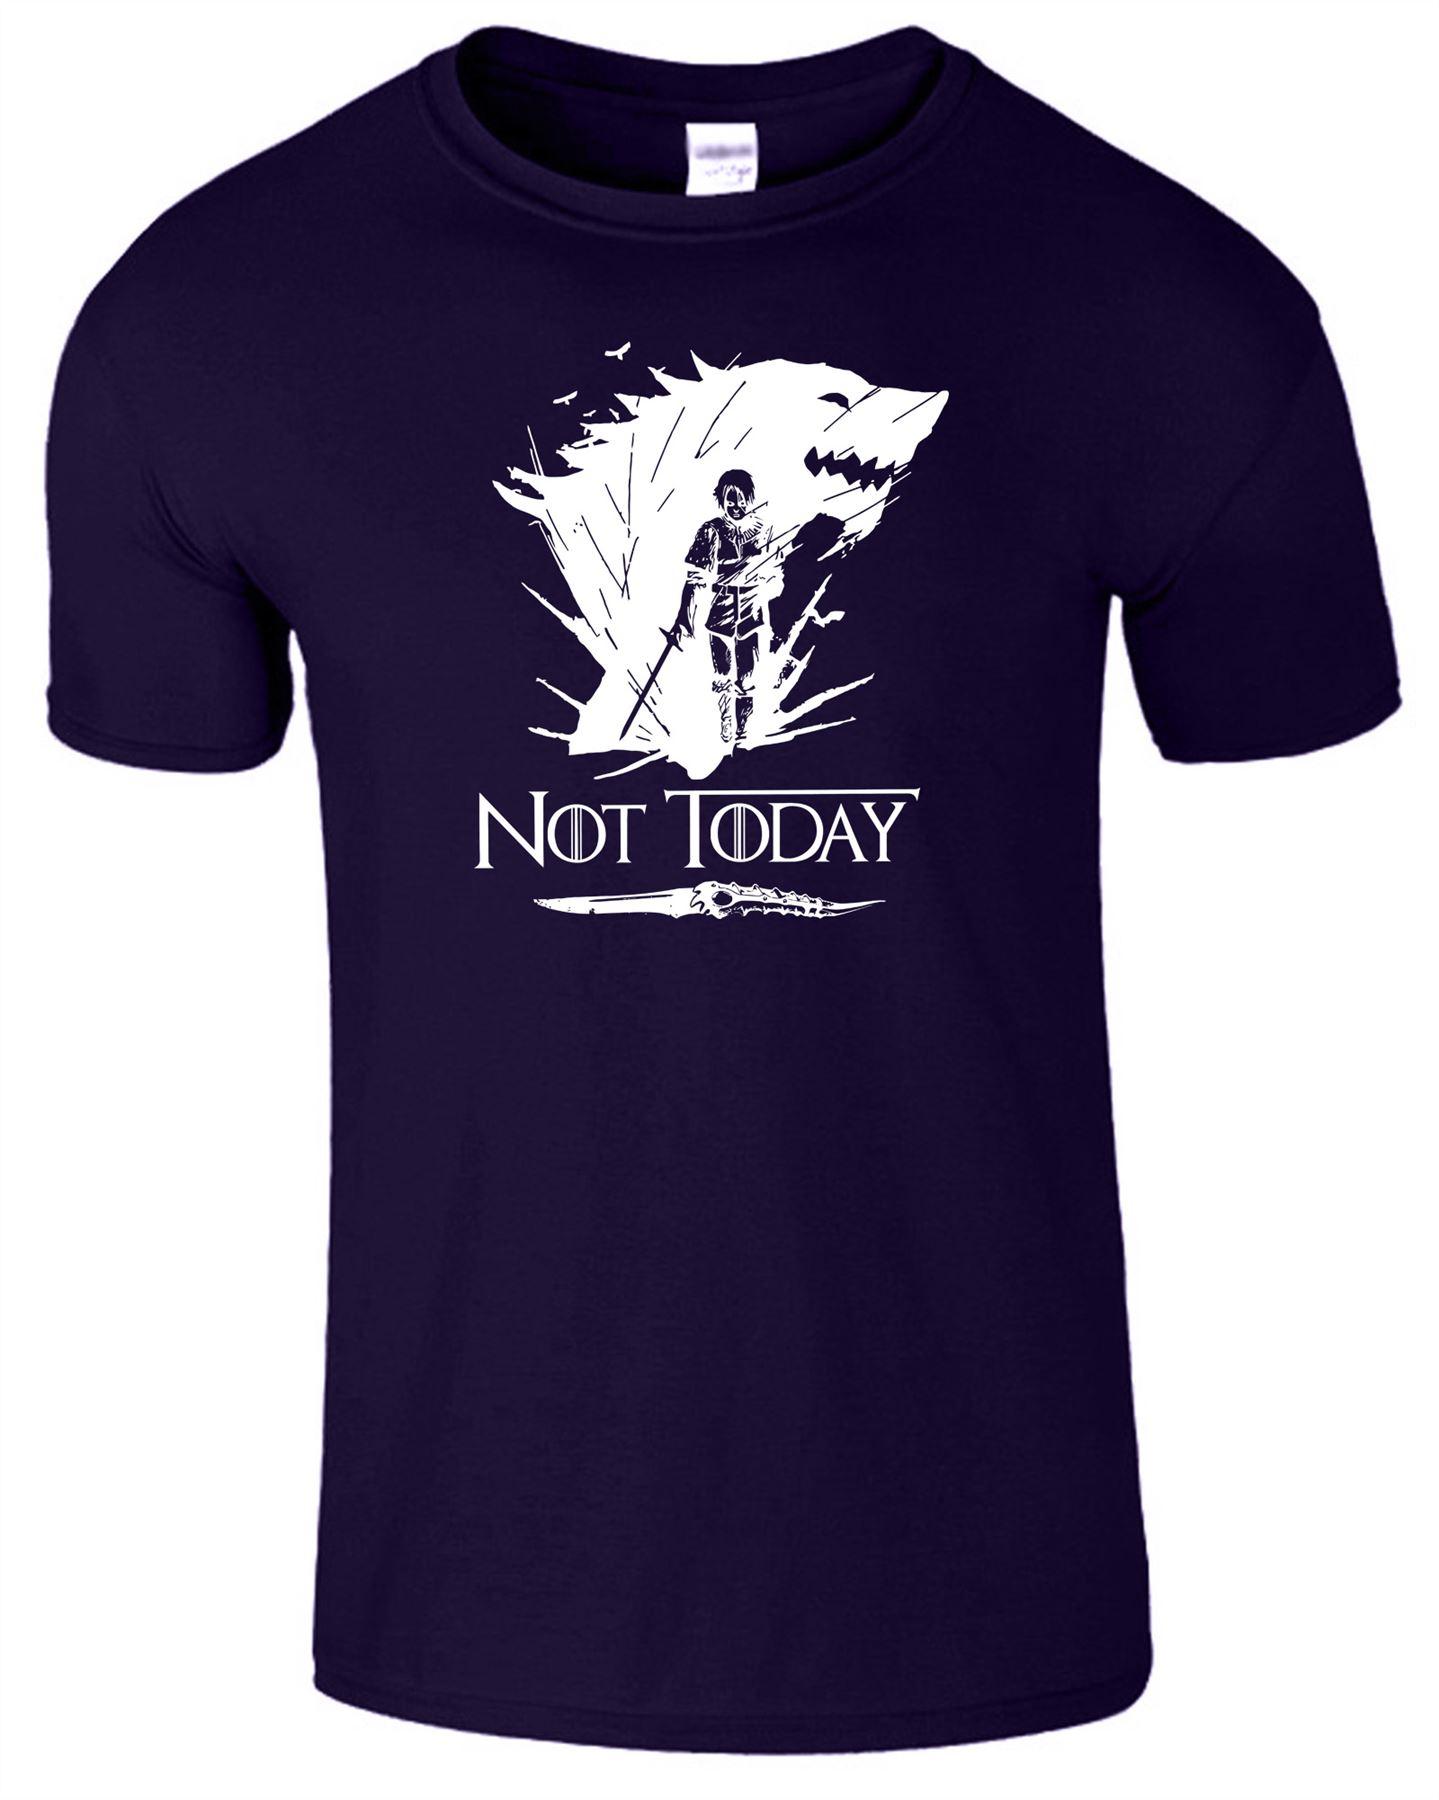 Arya-Stark-Not-Today-T-Shirt-Mens-Game-Season-Womens-Shirt-Adults-Unisex-Fit Indexbild 3